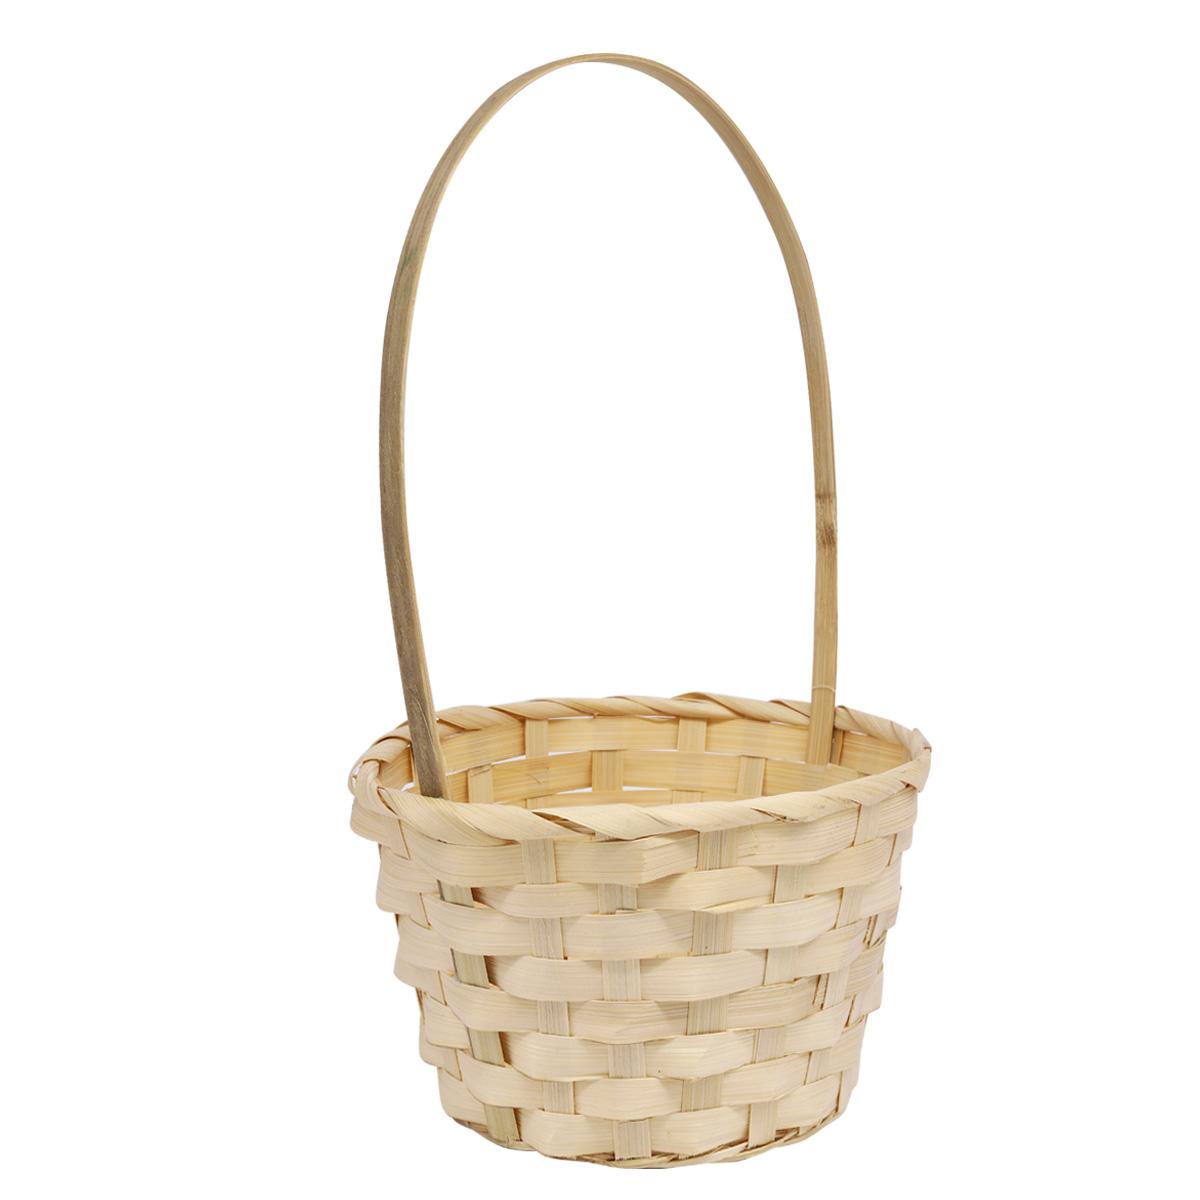 19HJ19084 Корзина плетеная бамбук 18*10*Н33см, цв. натуральный Астра